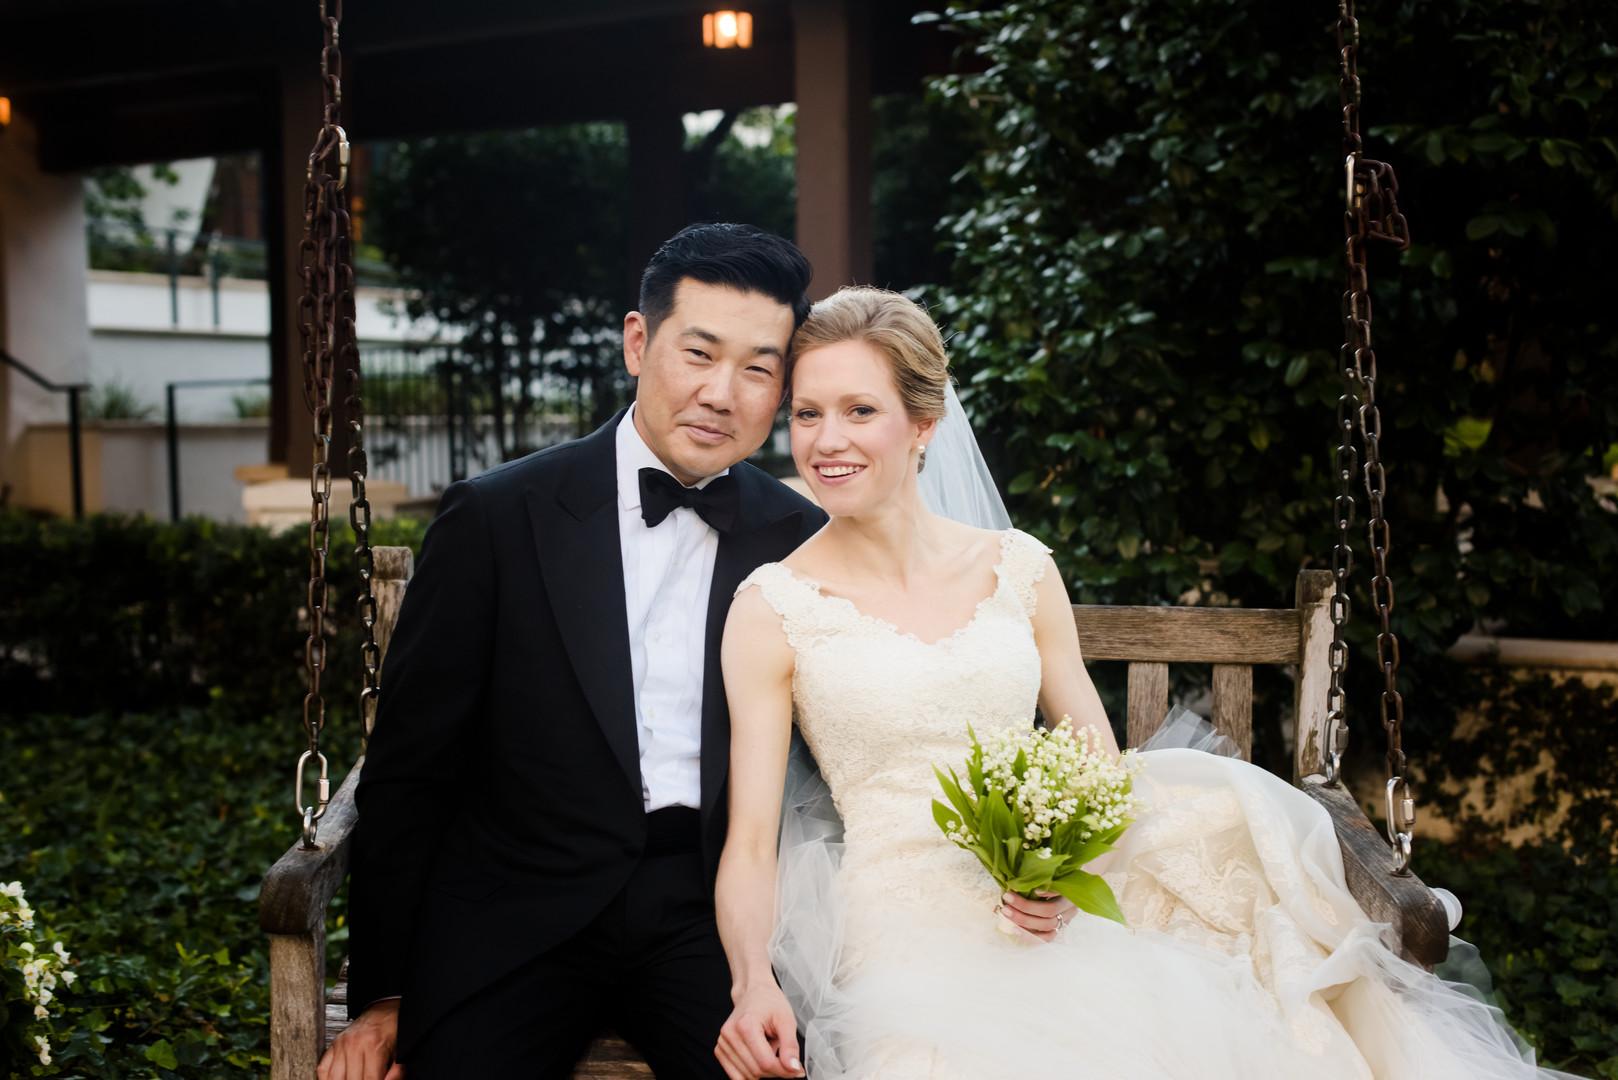 the-cloister-at-sea-island-wedding-27.JPG